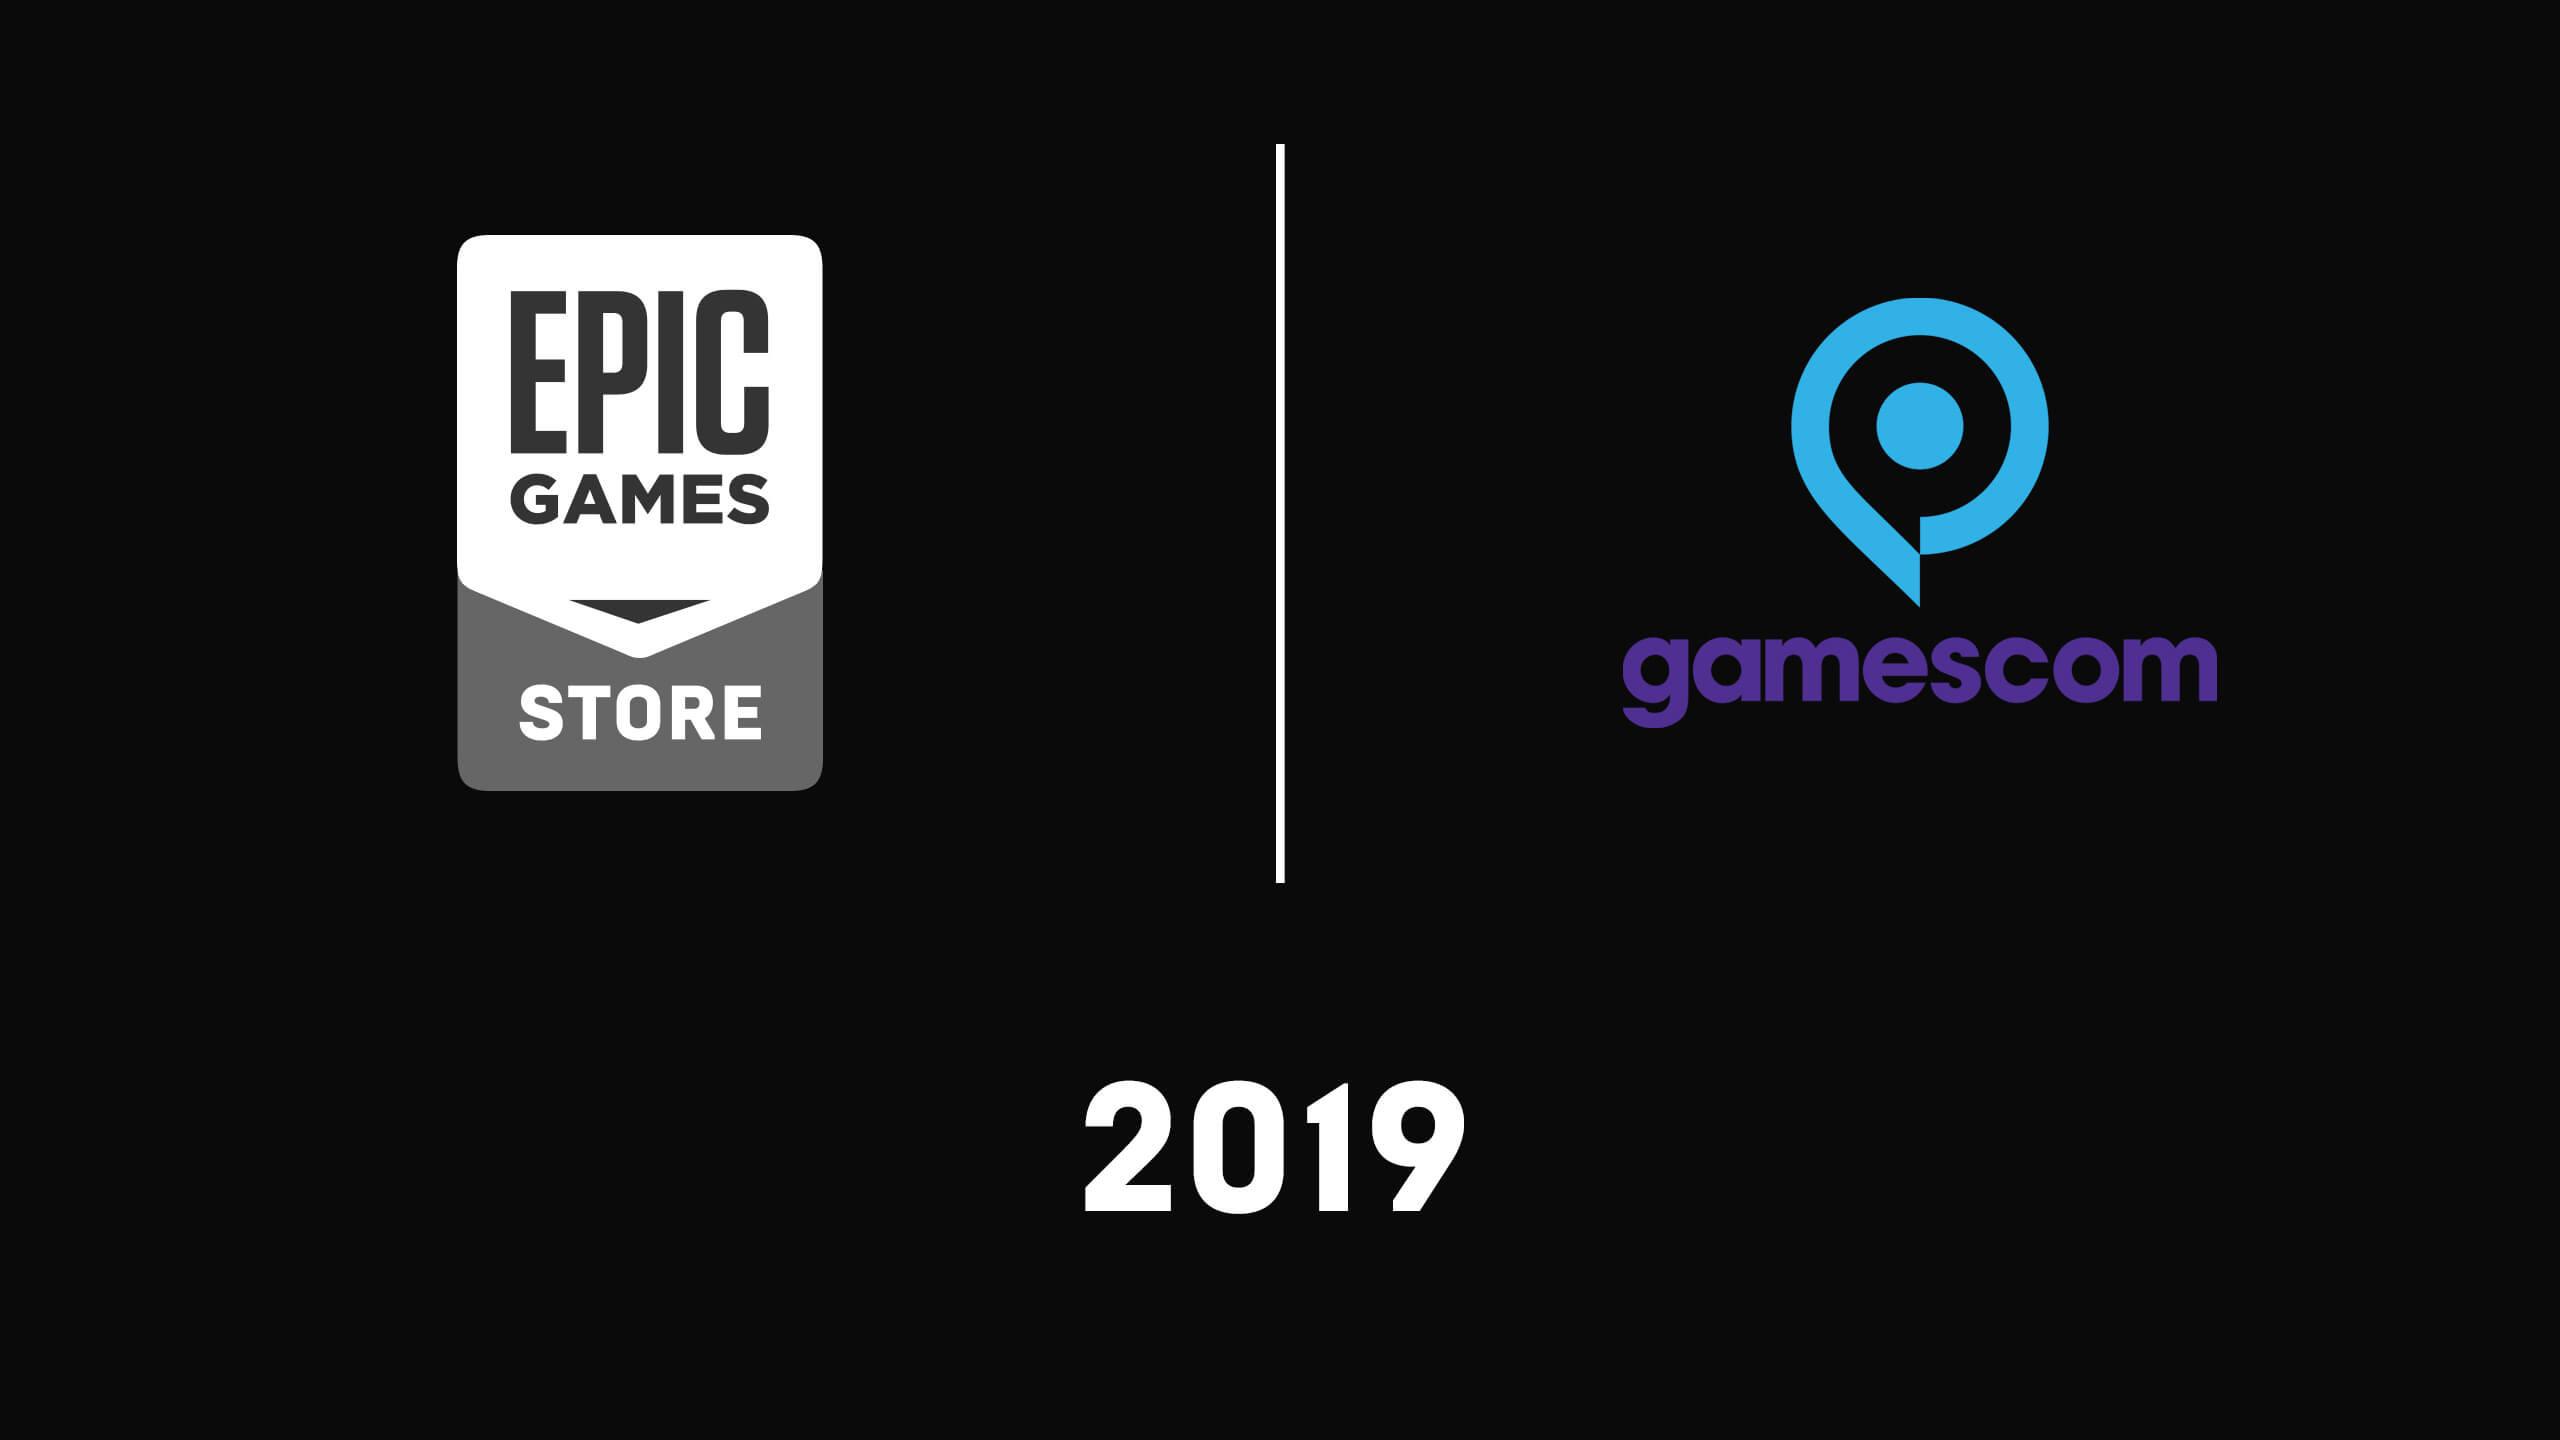 Epic商城:2019年下半年限时独占游戏公布